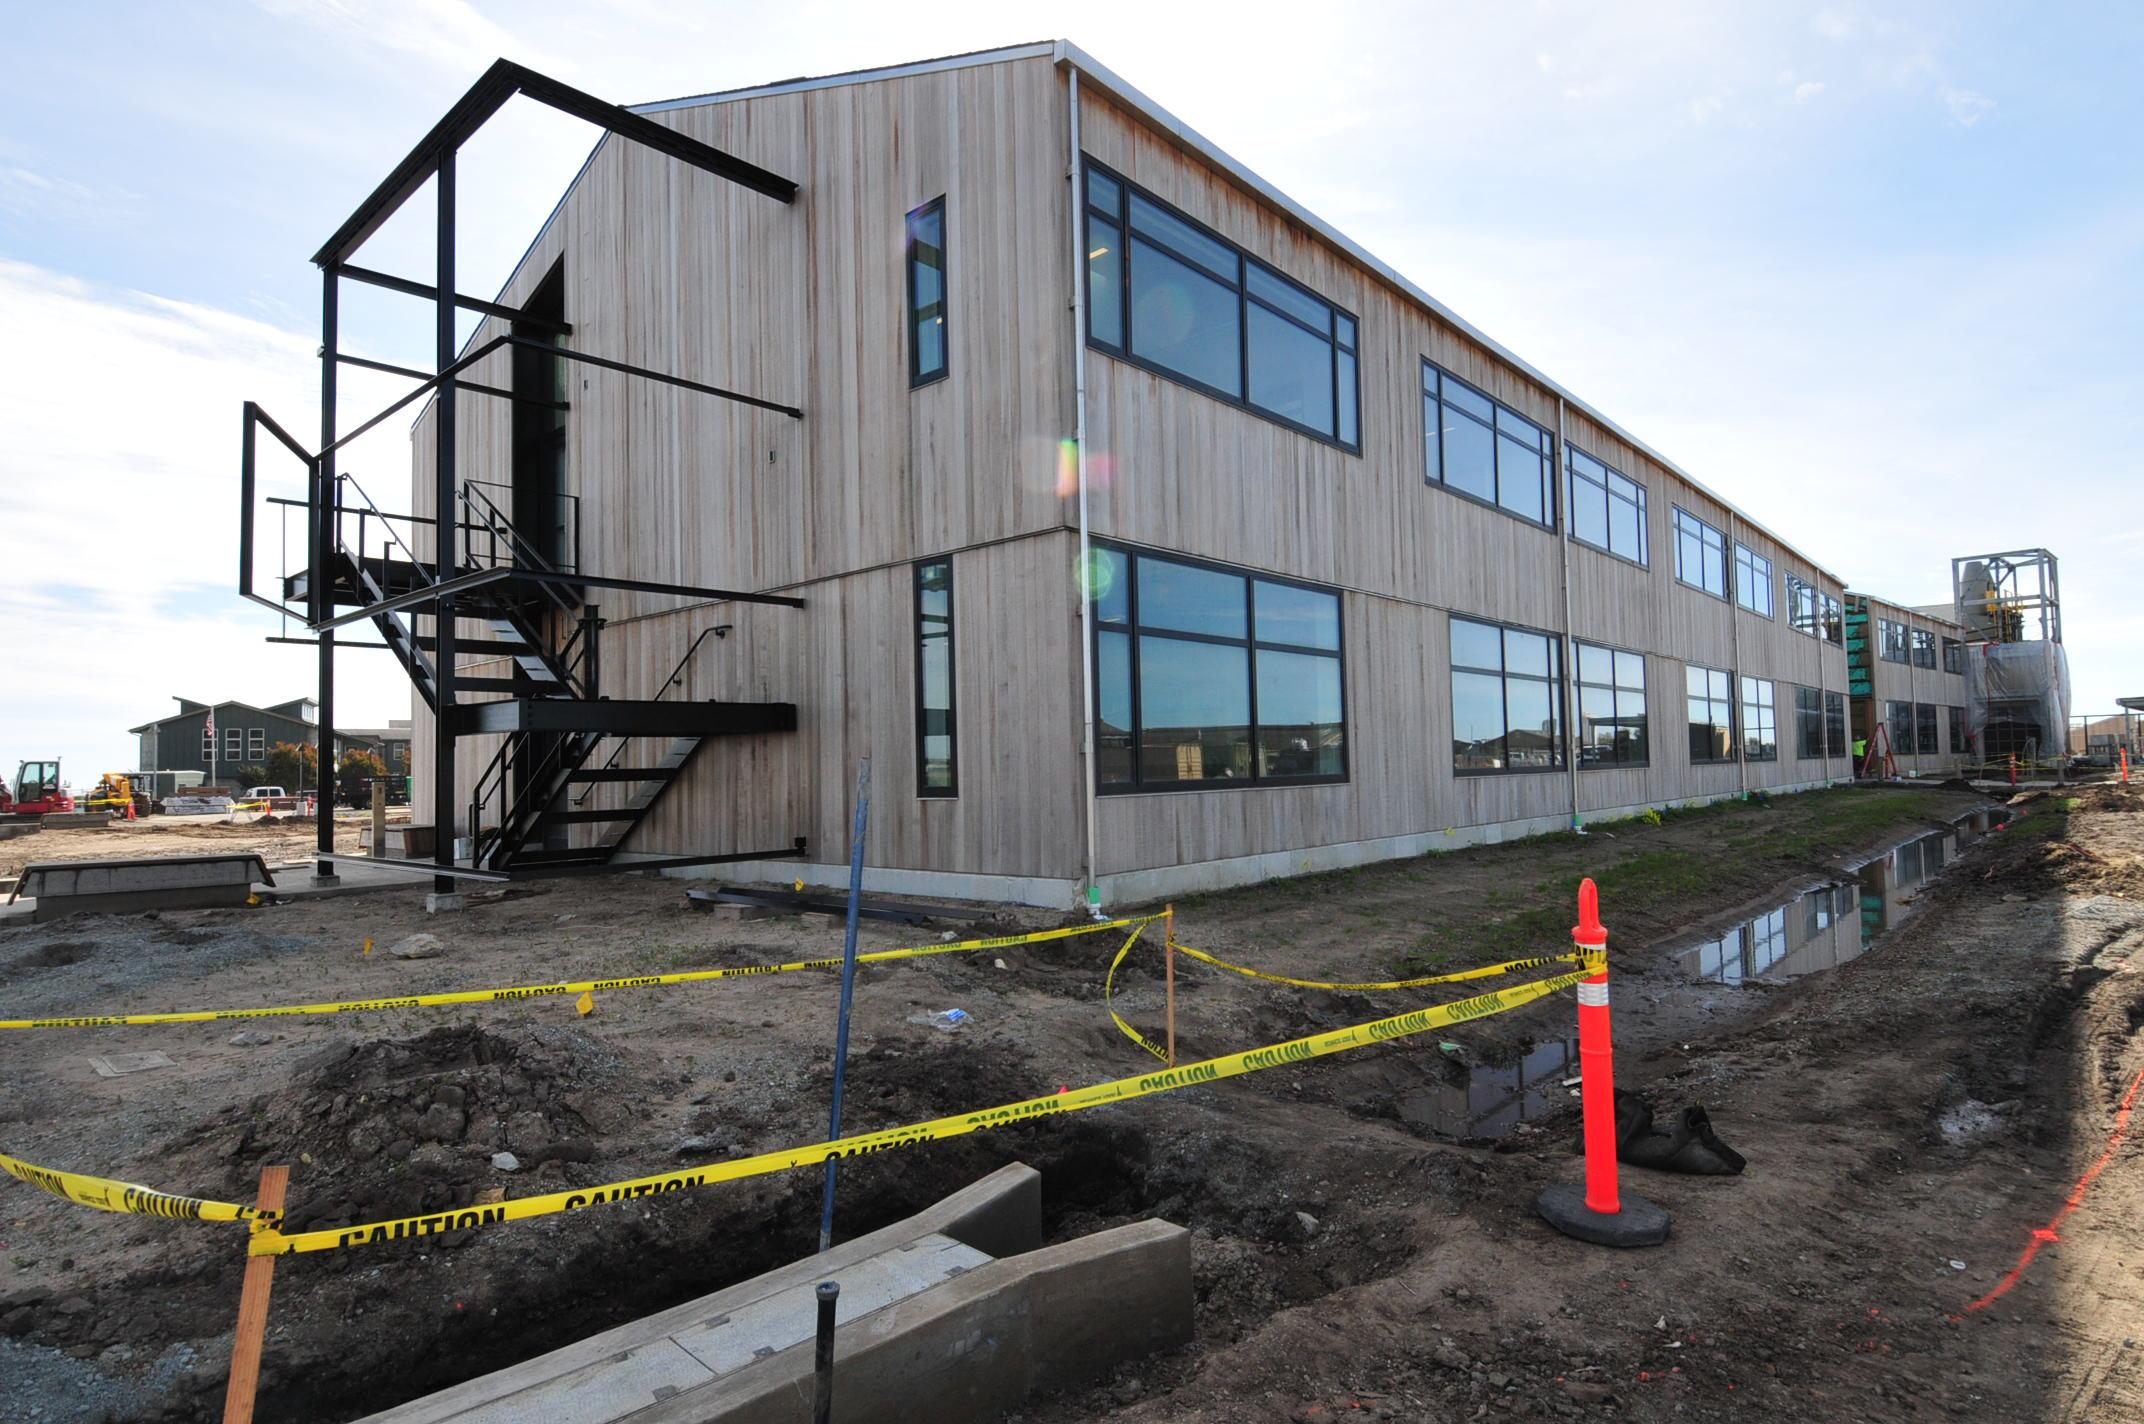 Exterior Photo Documentation of Construction Site